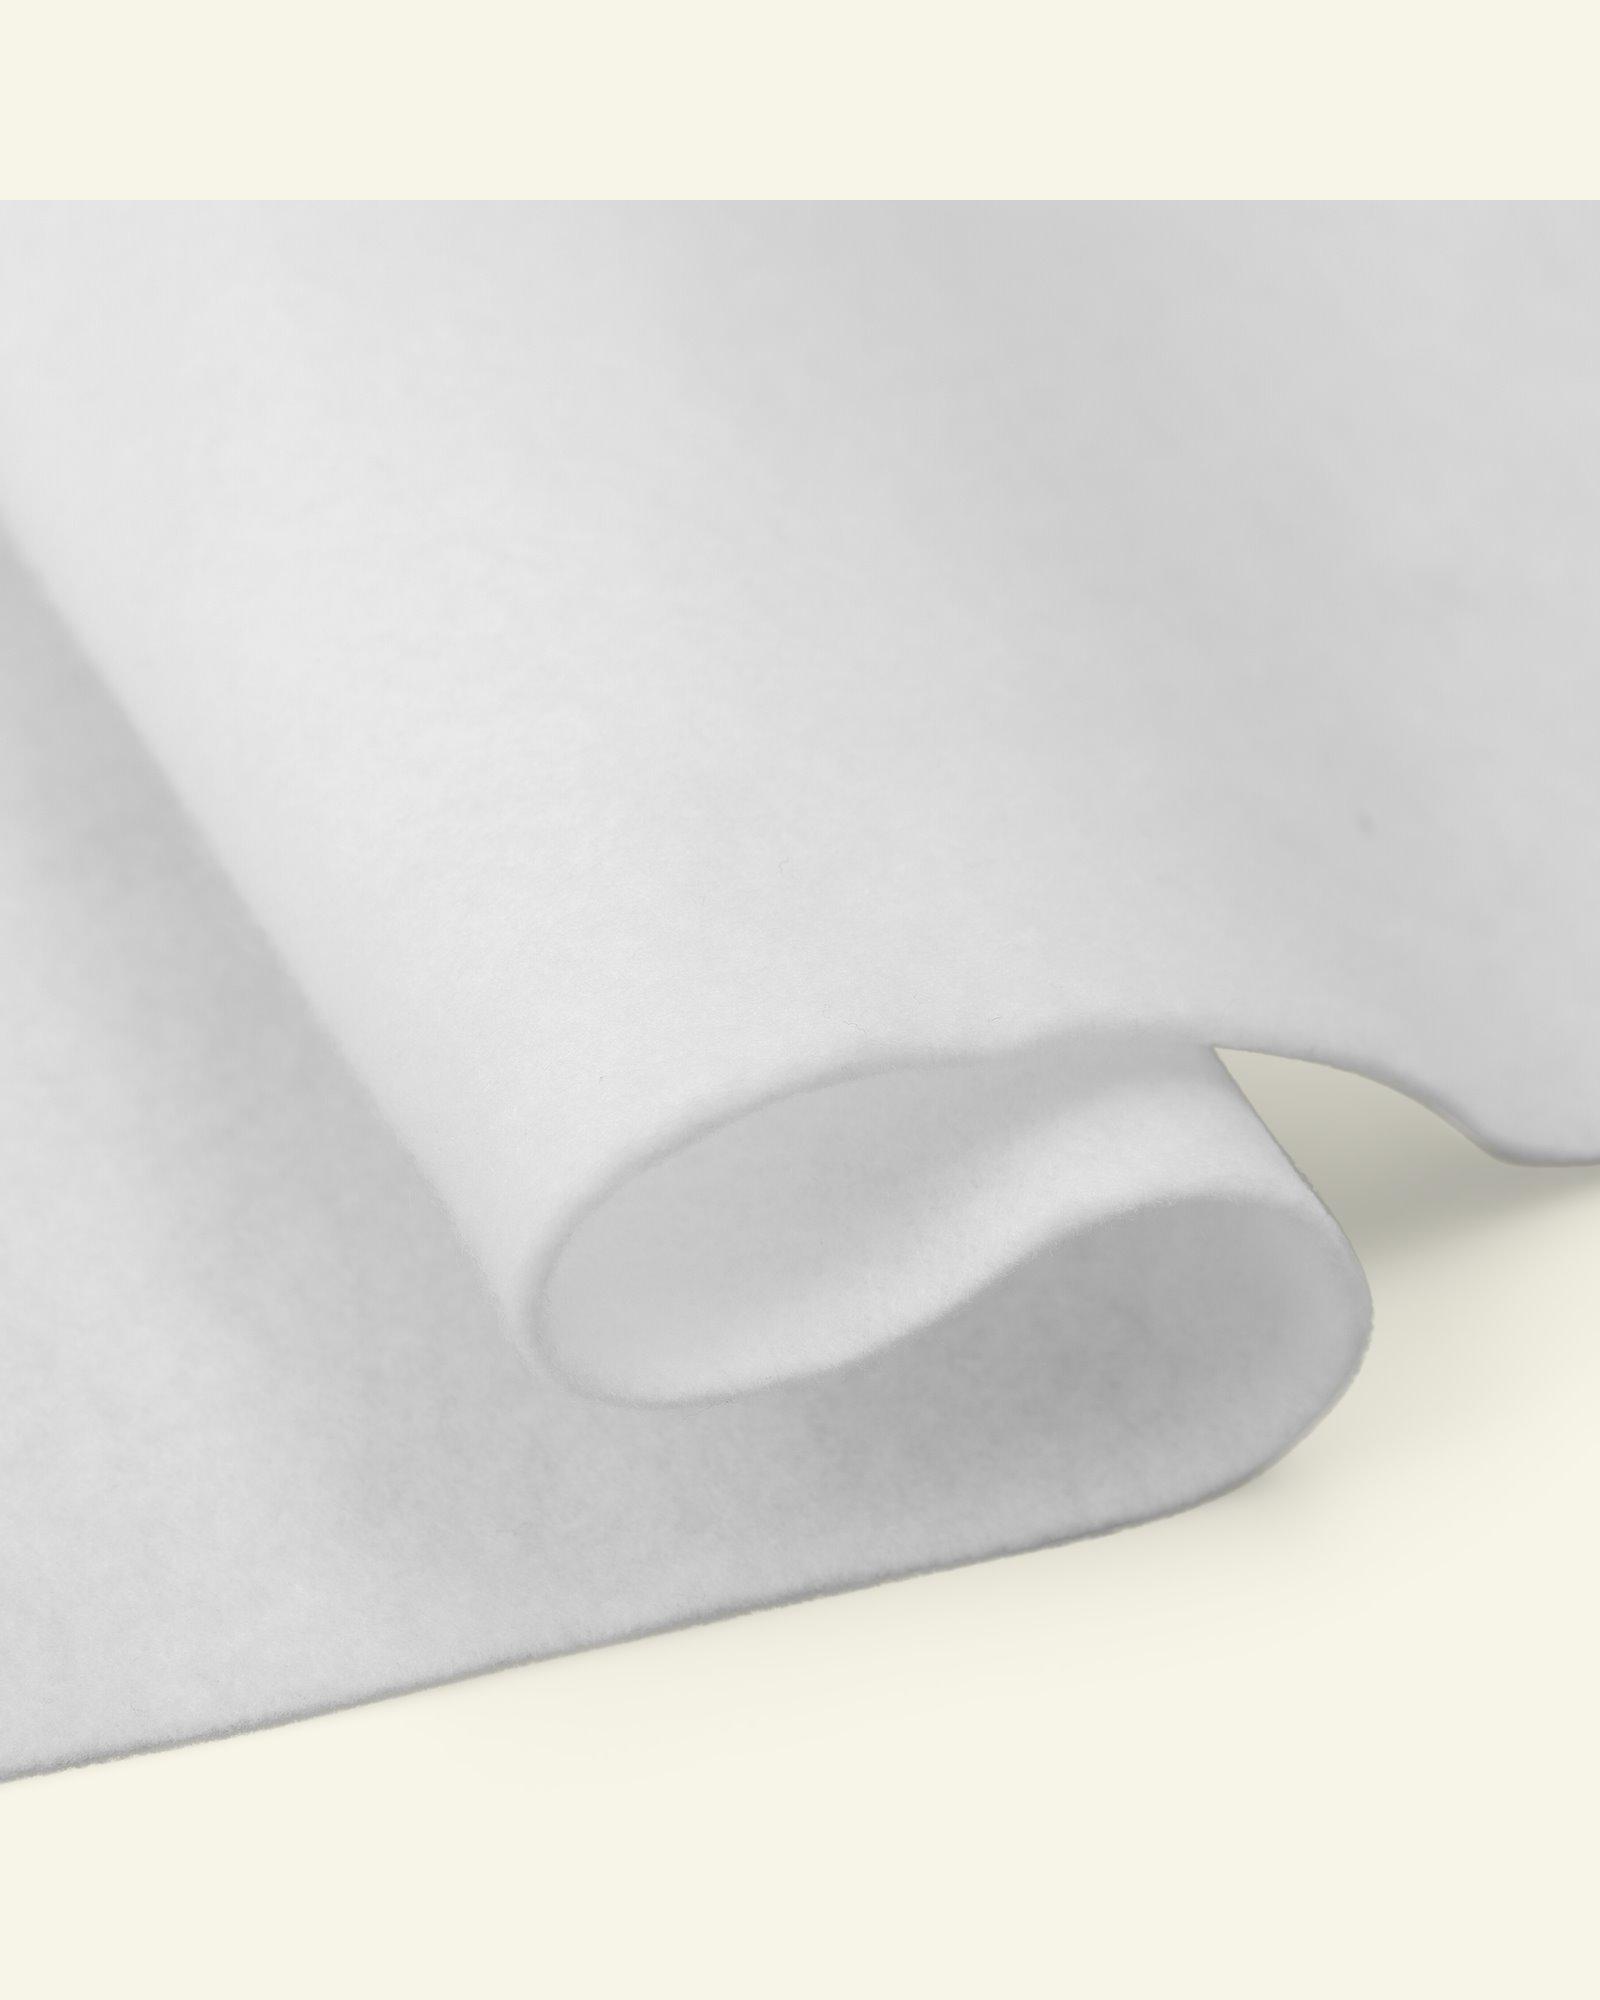 Thermolam Freudenberg W:90 cm 180g/m2